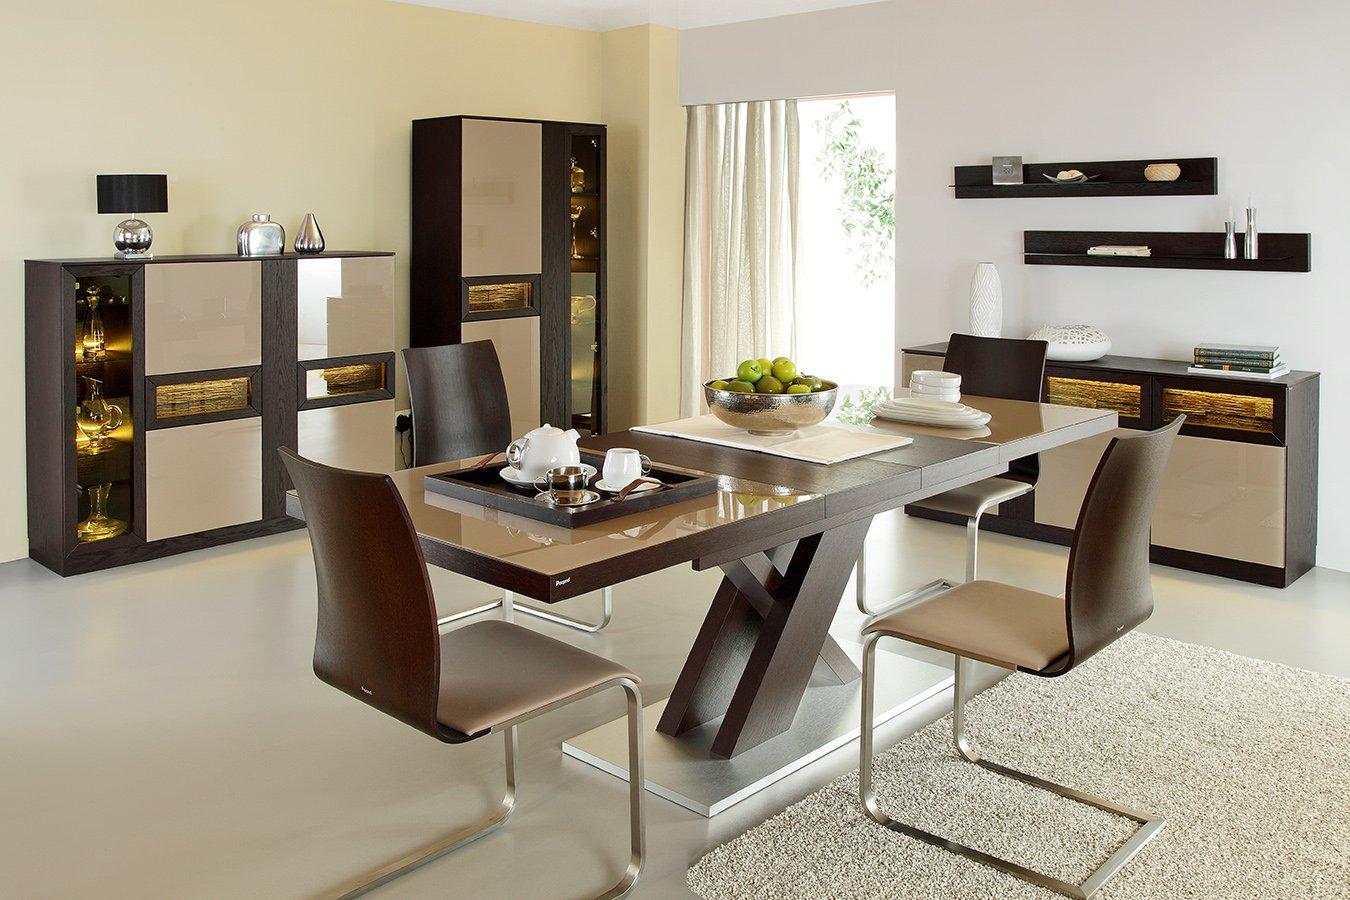 test1 Мебель для столовой New York (Paged Meble, Польша)